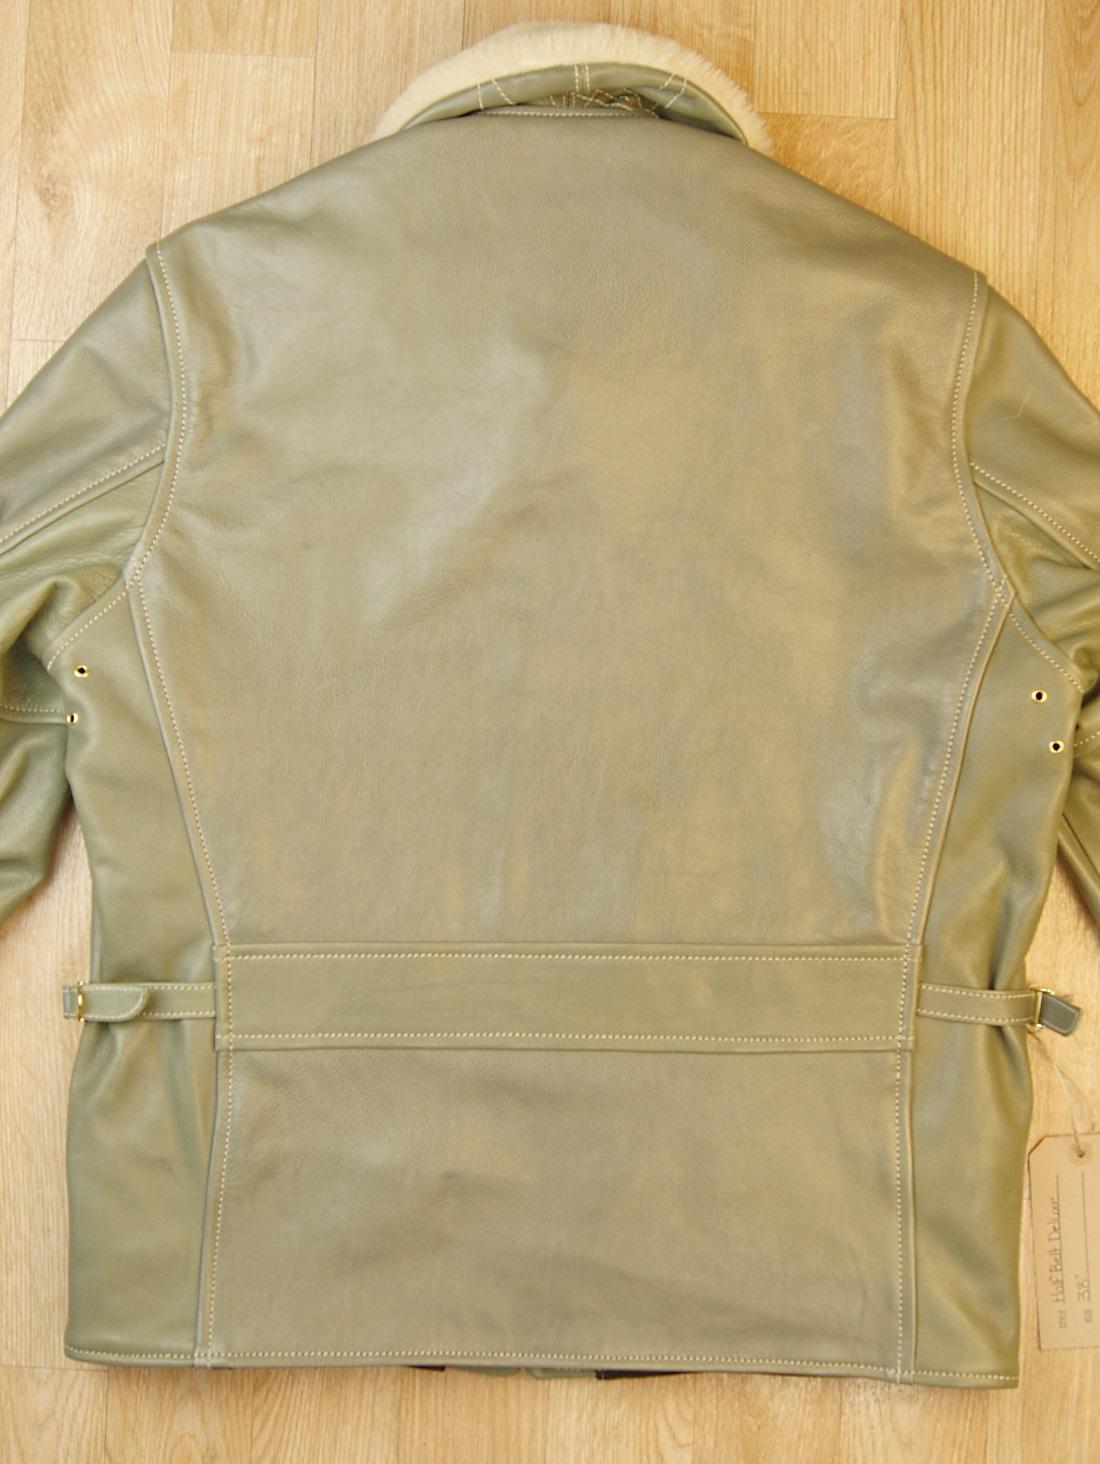 Aero Half Belt Deluxe Olive Vicenza Horsehide Blonde Fur collar back.jpg